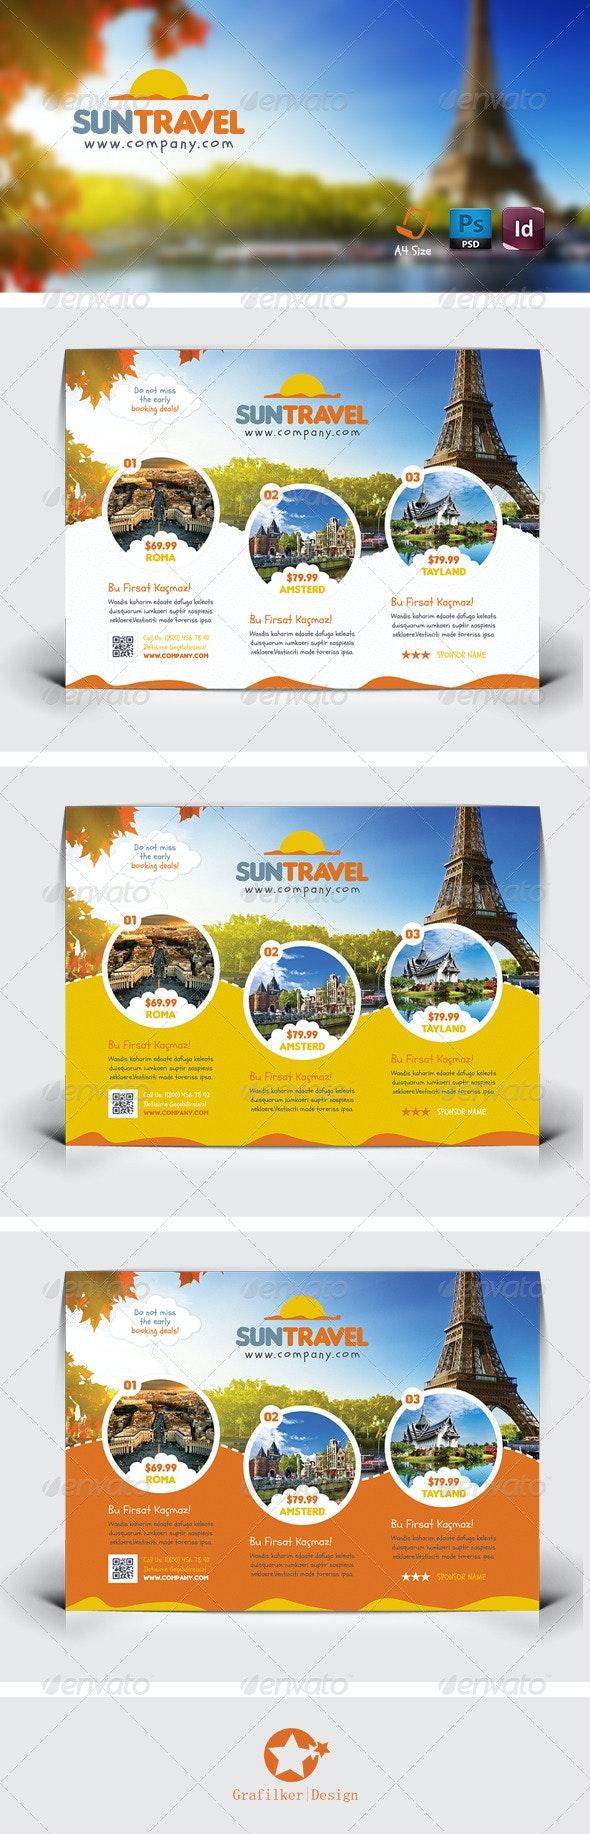 Travel Tour Flyer Templates - Corporate Flyers